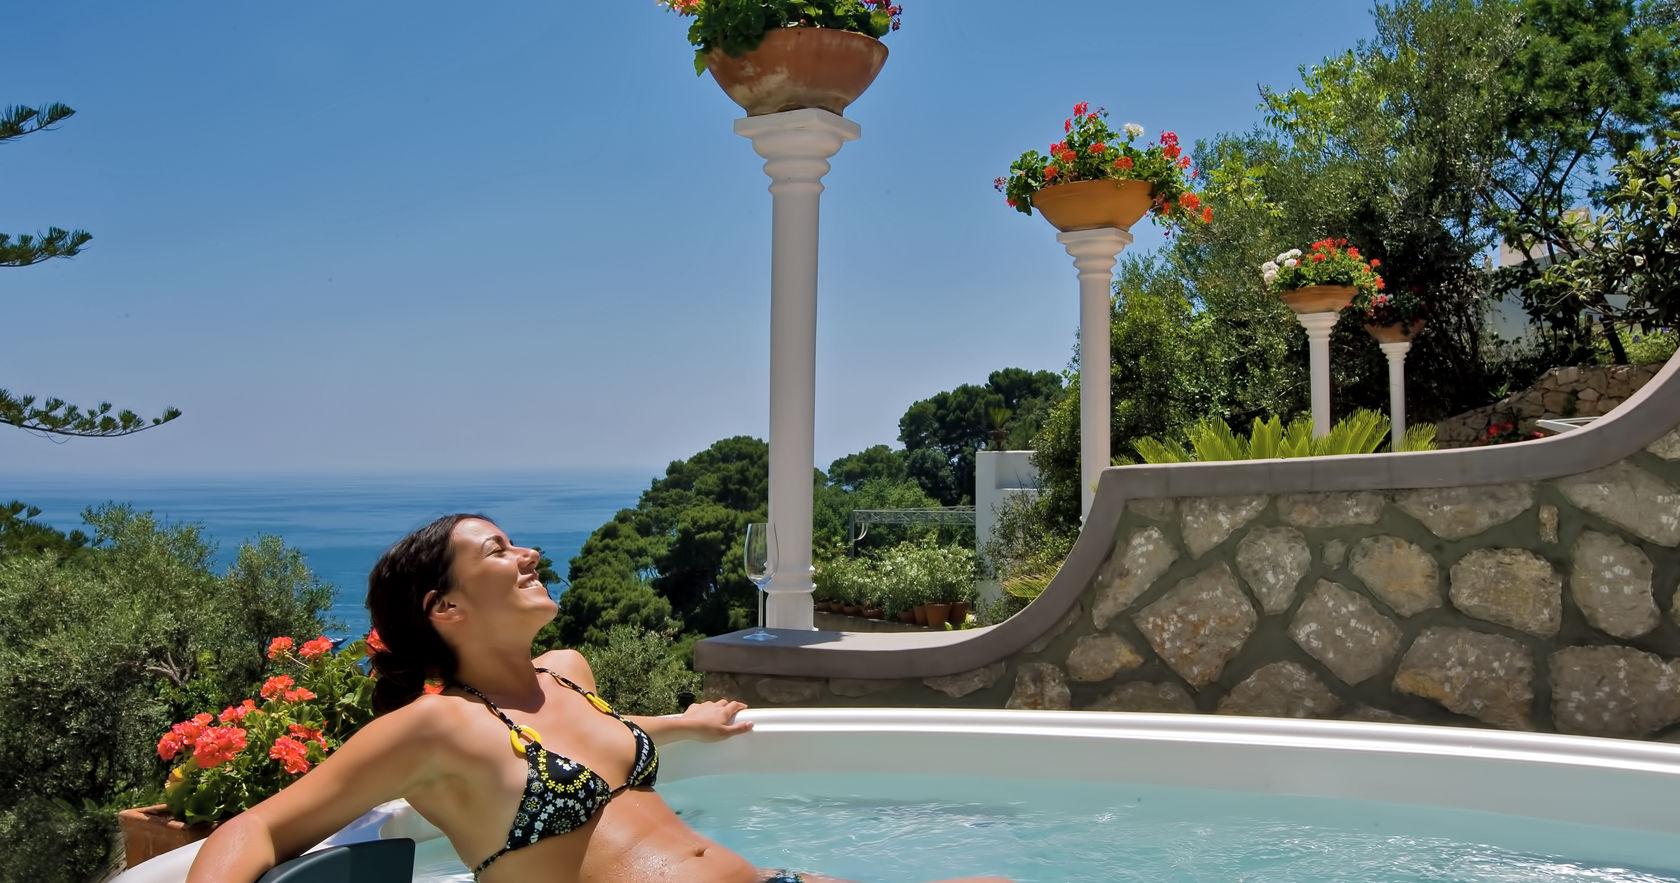 Capri Hotels 4 star, Best Luxury Hotels in Capri Italy ...